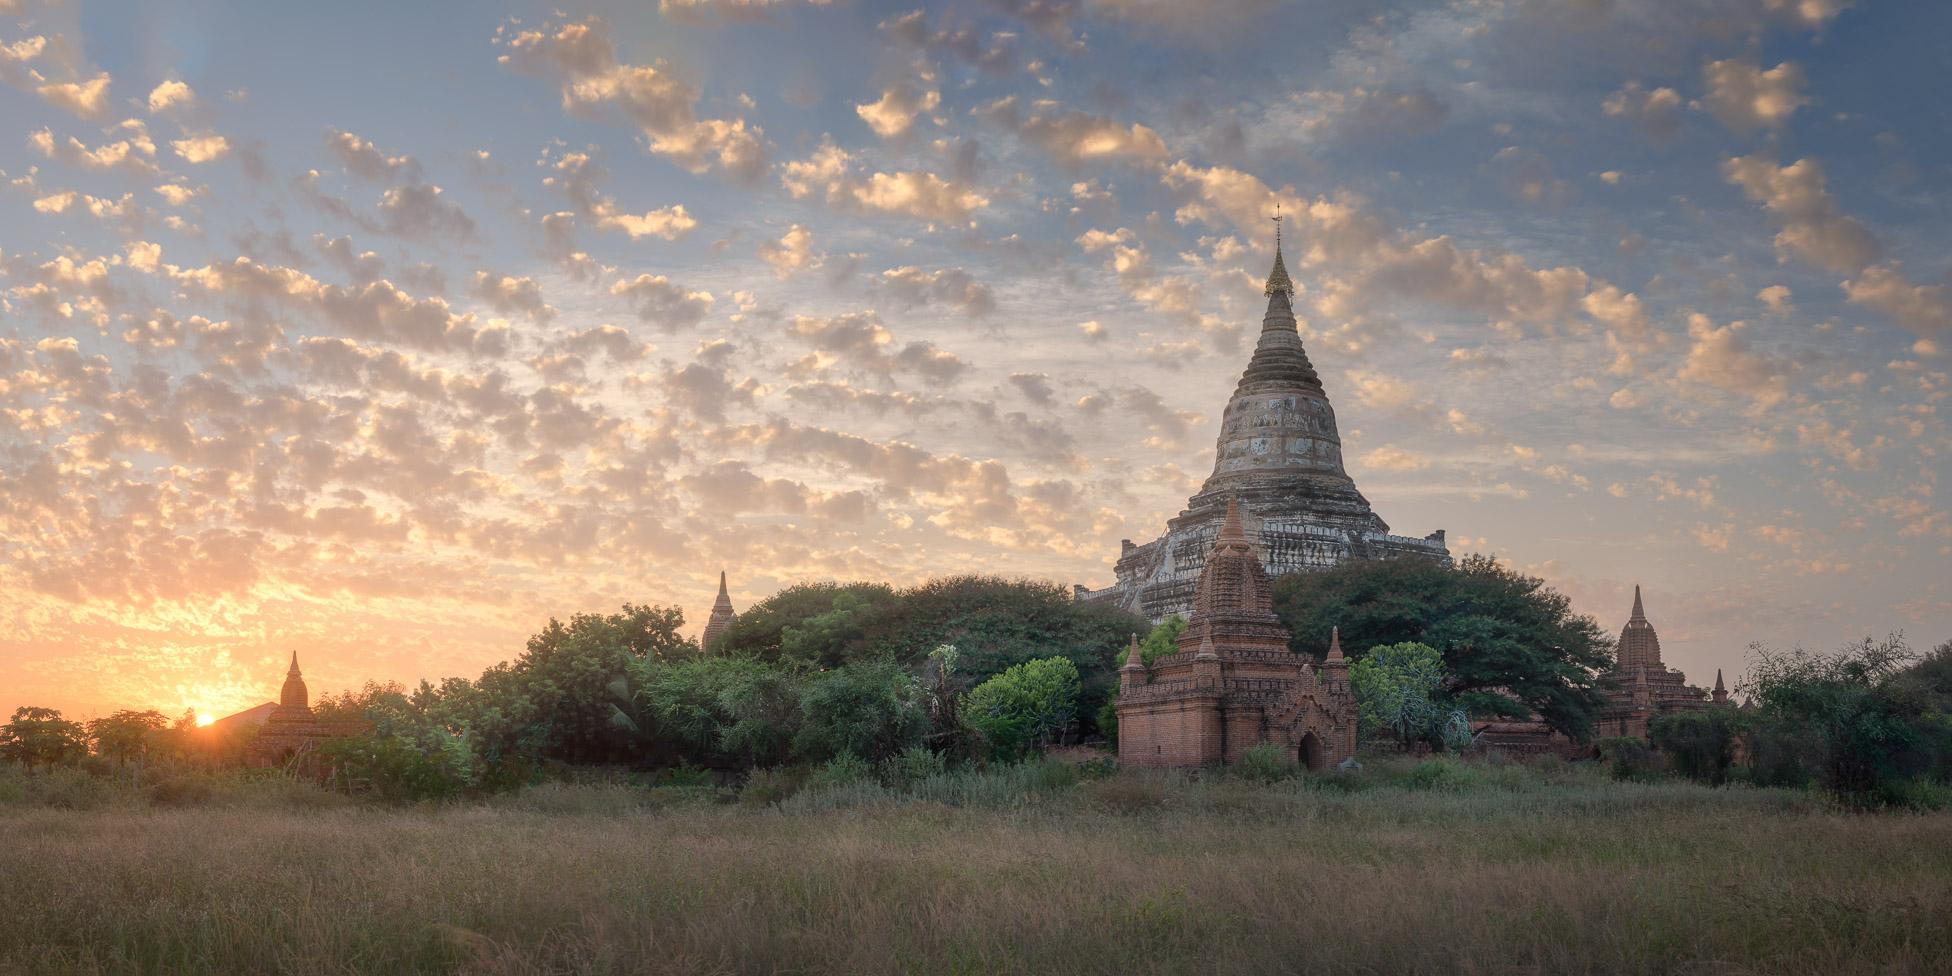 chùa Shwesandaw